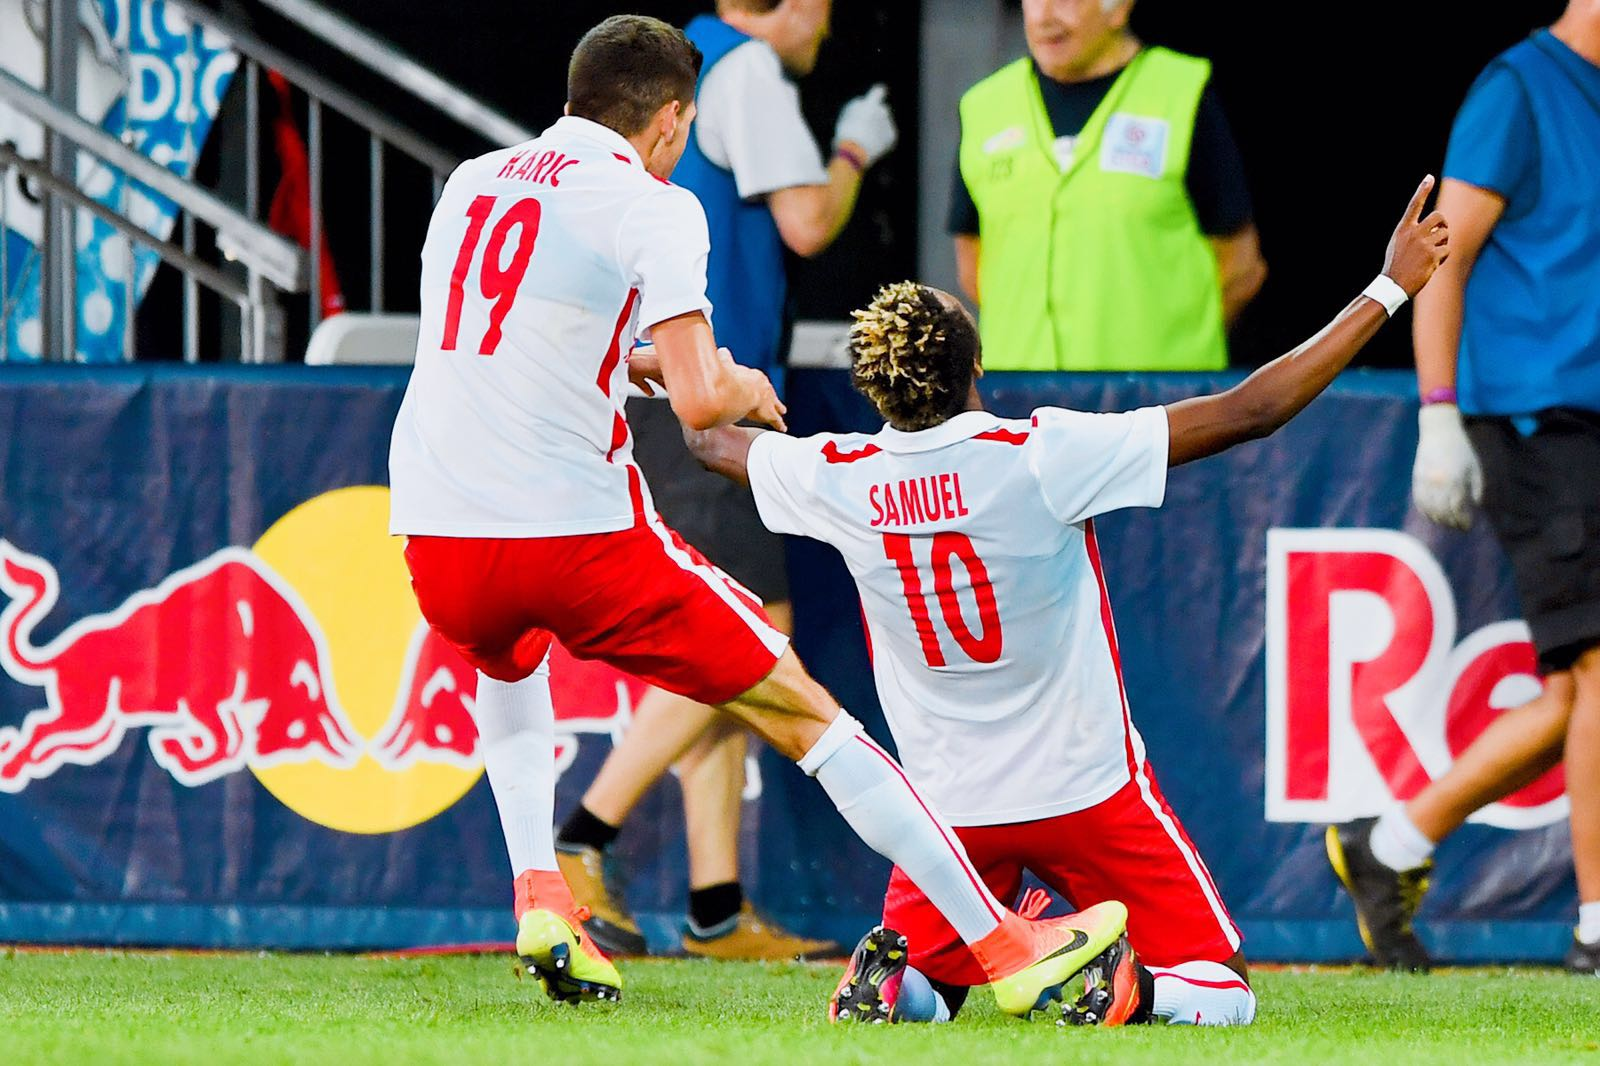 PHOTOS: Black Stars striker Samuel Tetteh scores AGAIN for Liefering in Austria